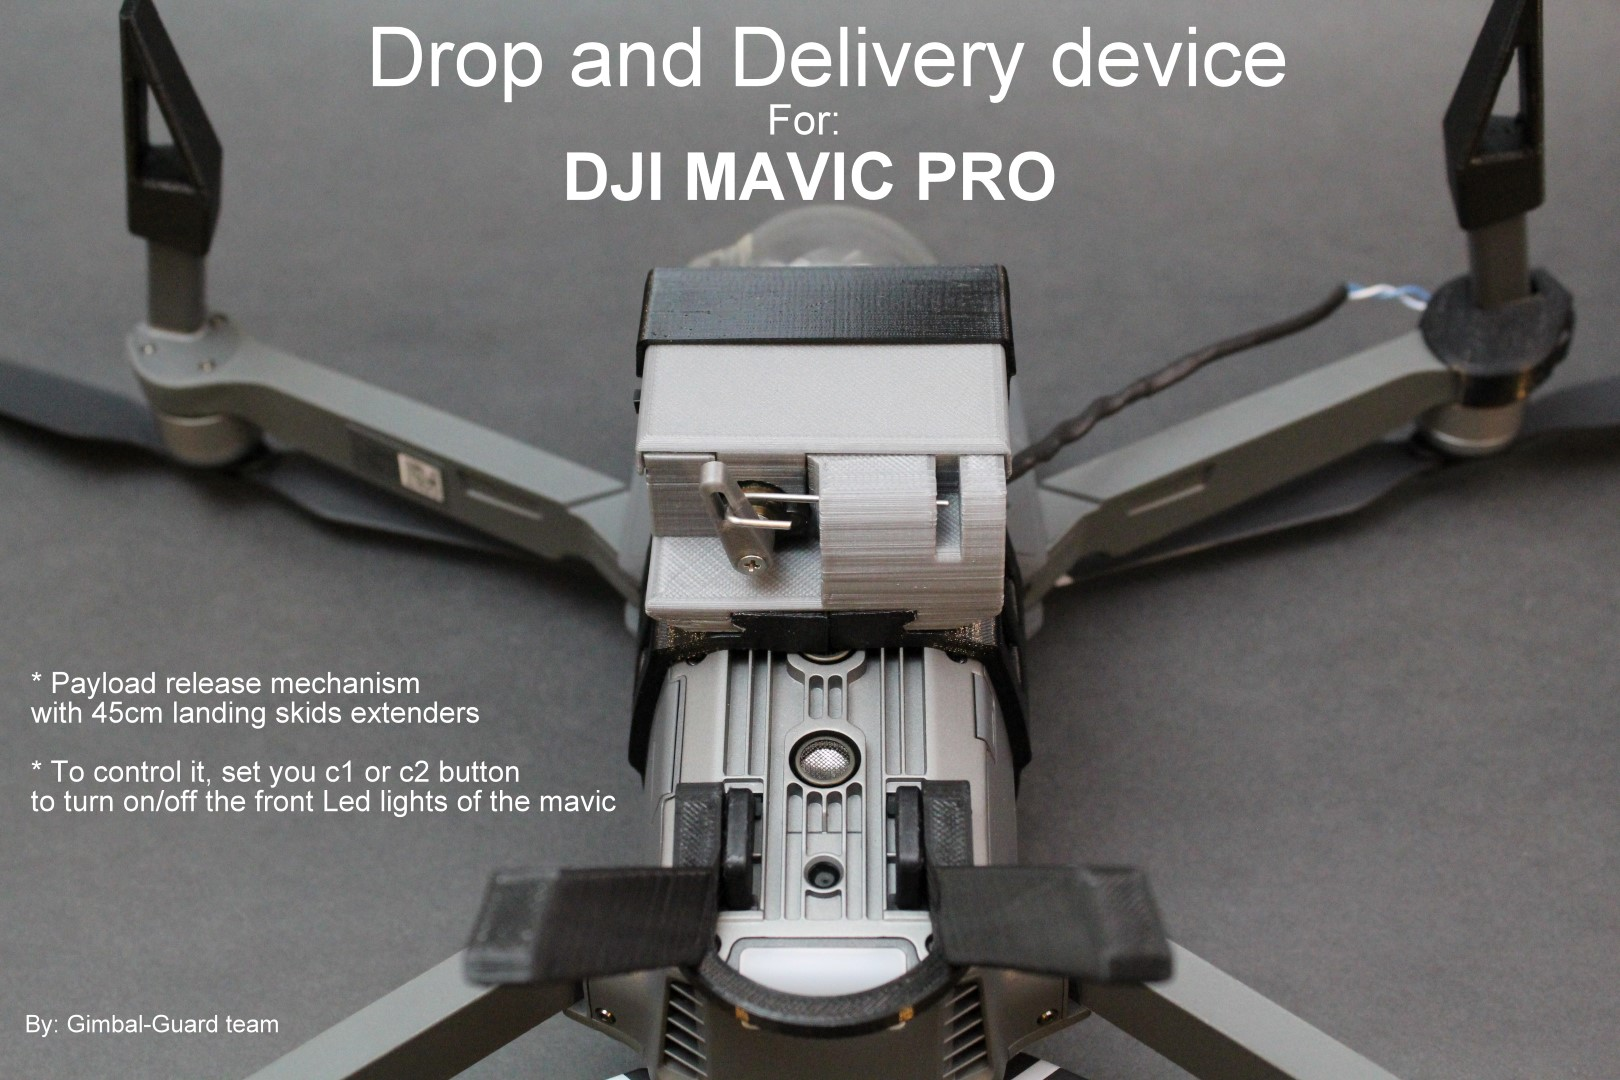 dji mavic drop device